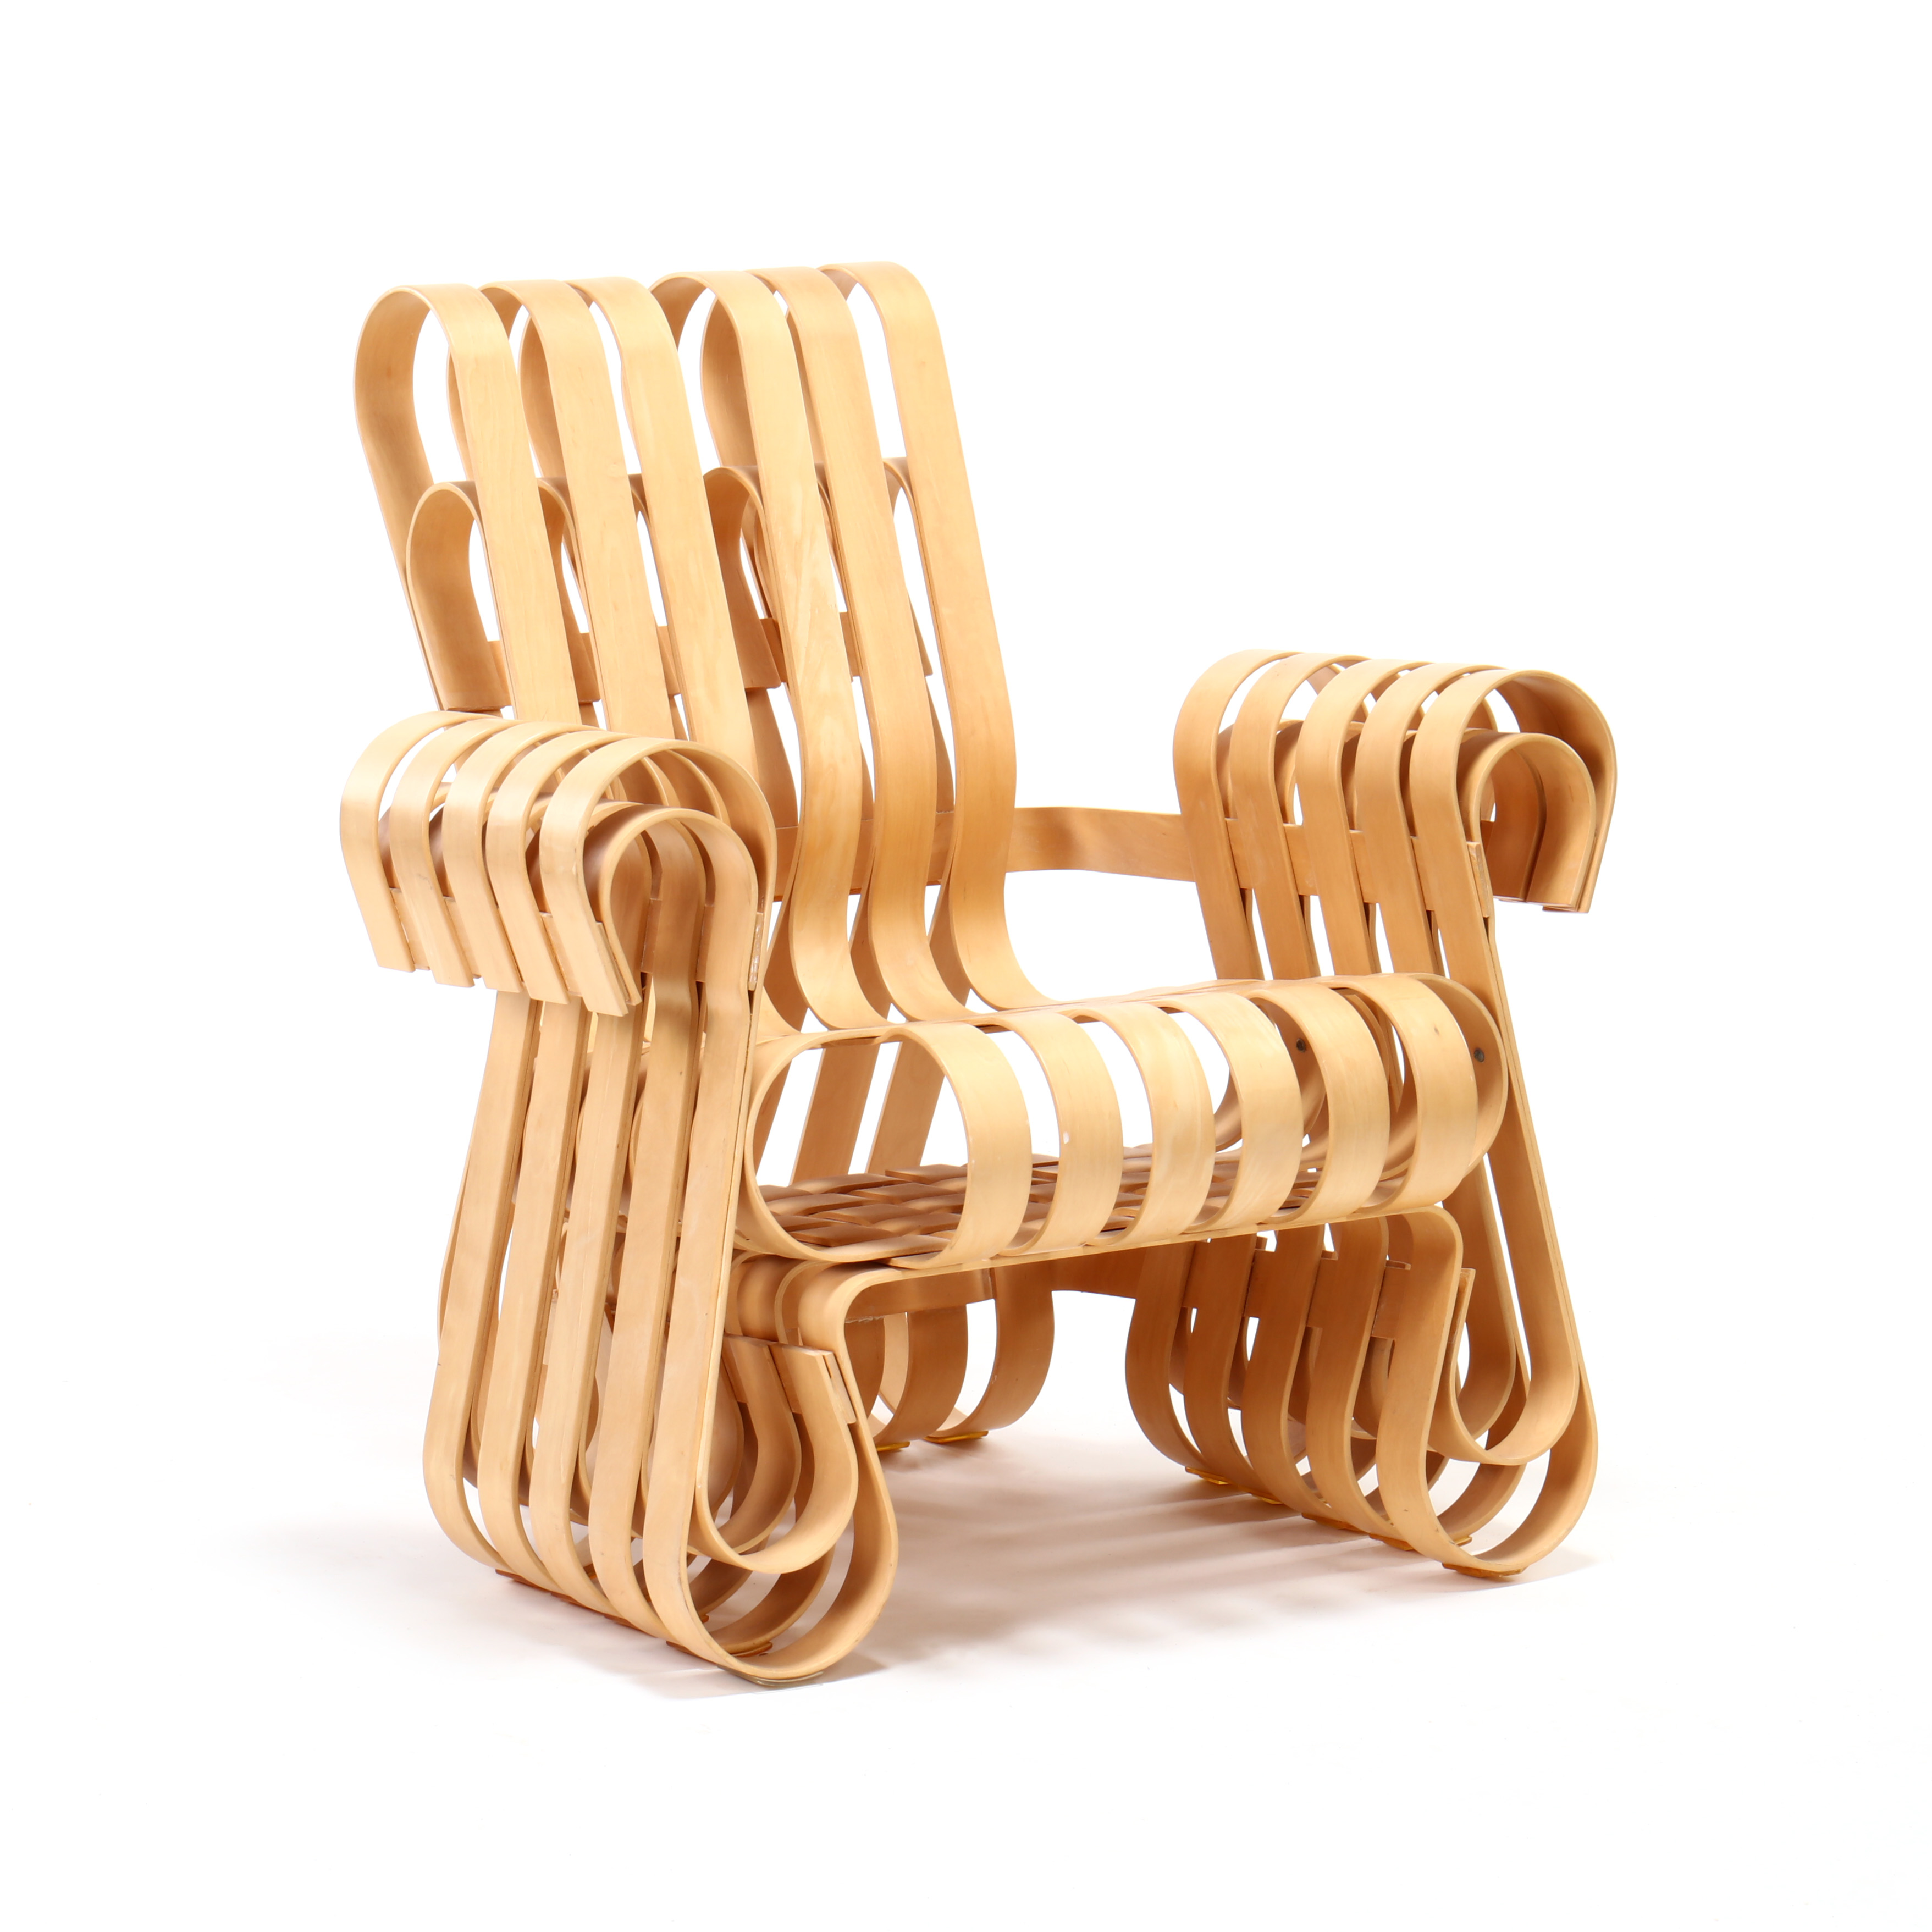 Frank Gehry, Power Play Chair. 1994, Knoll.